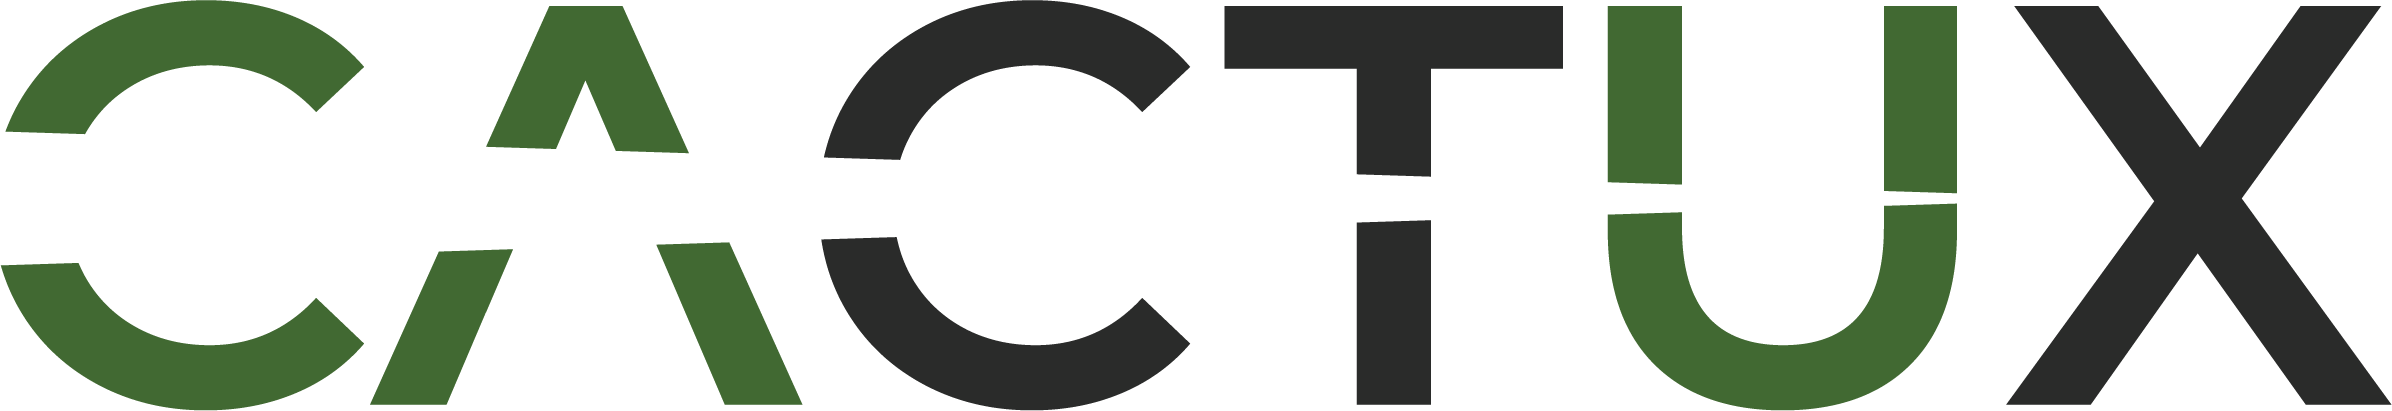 CactuX